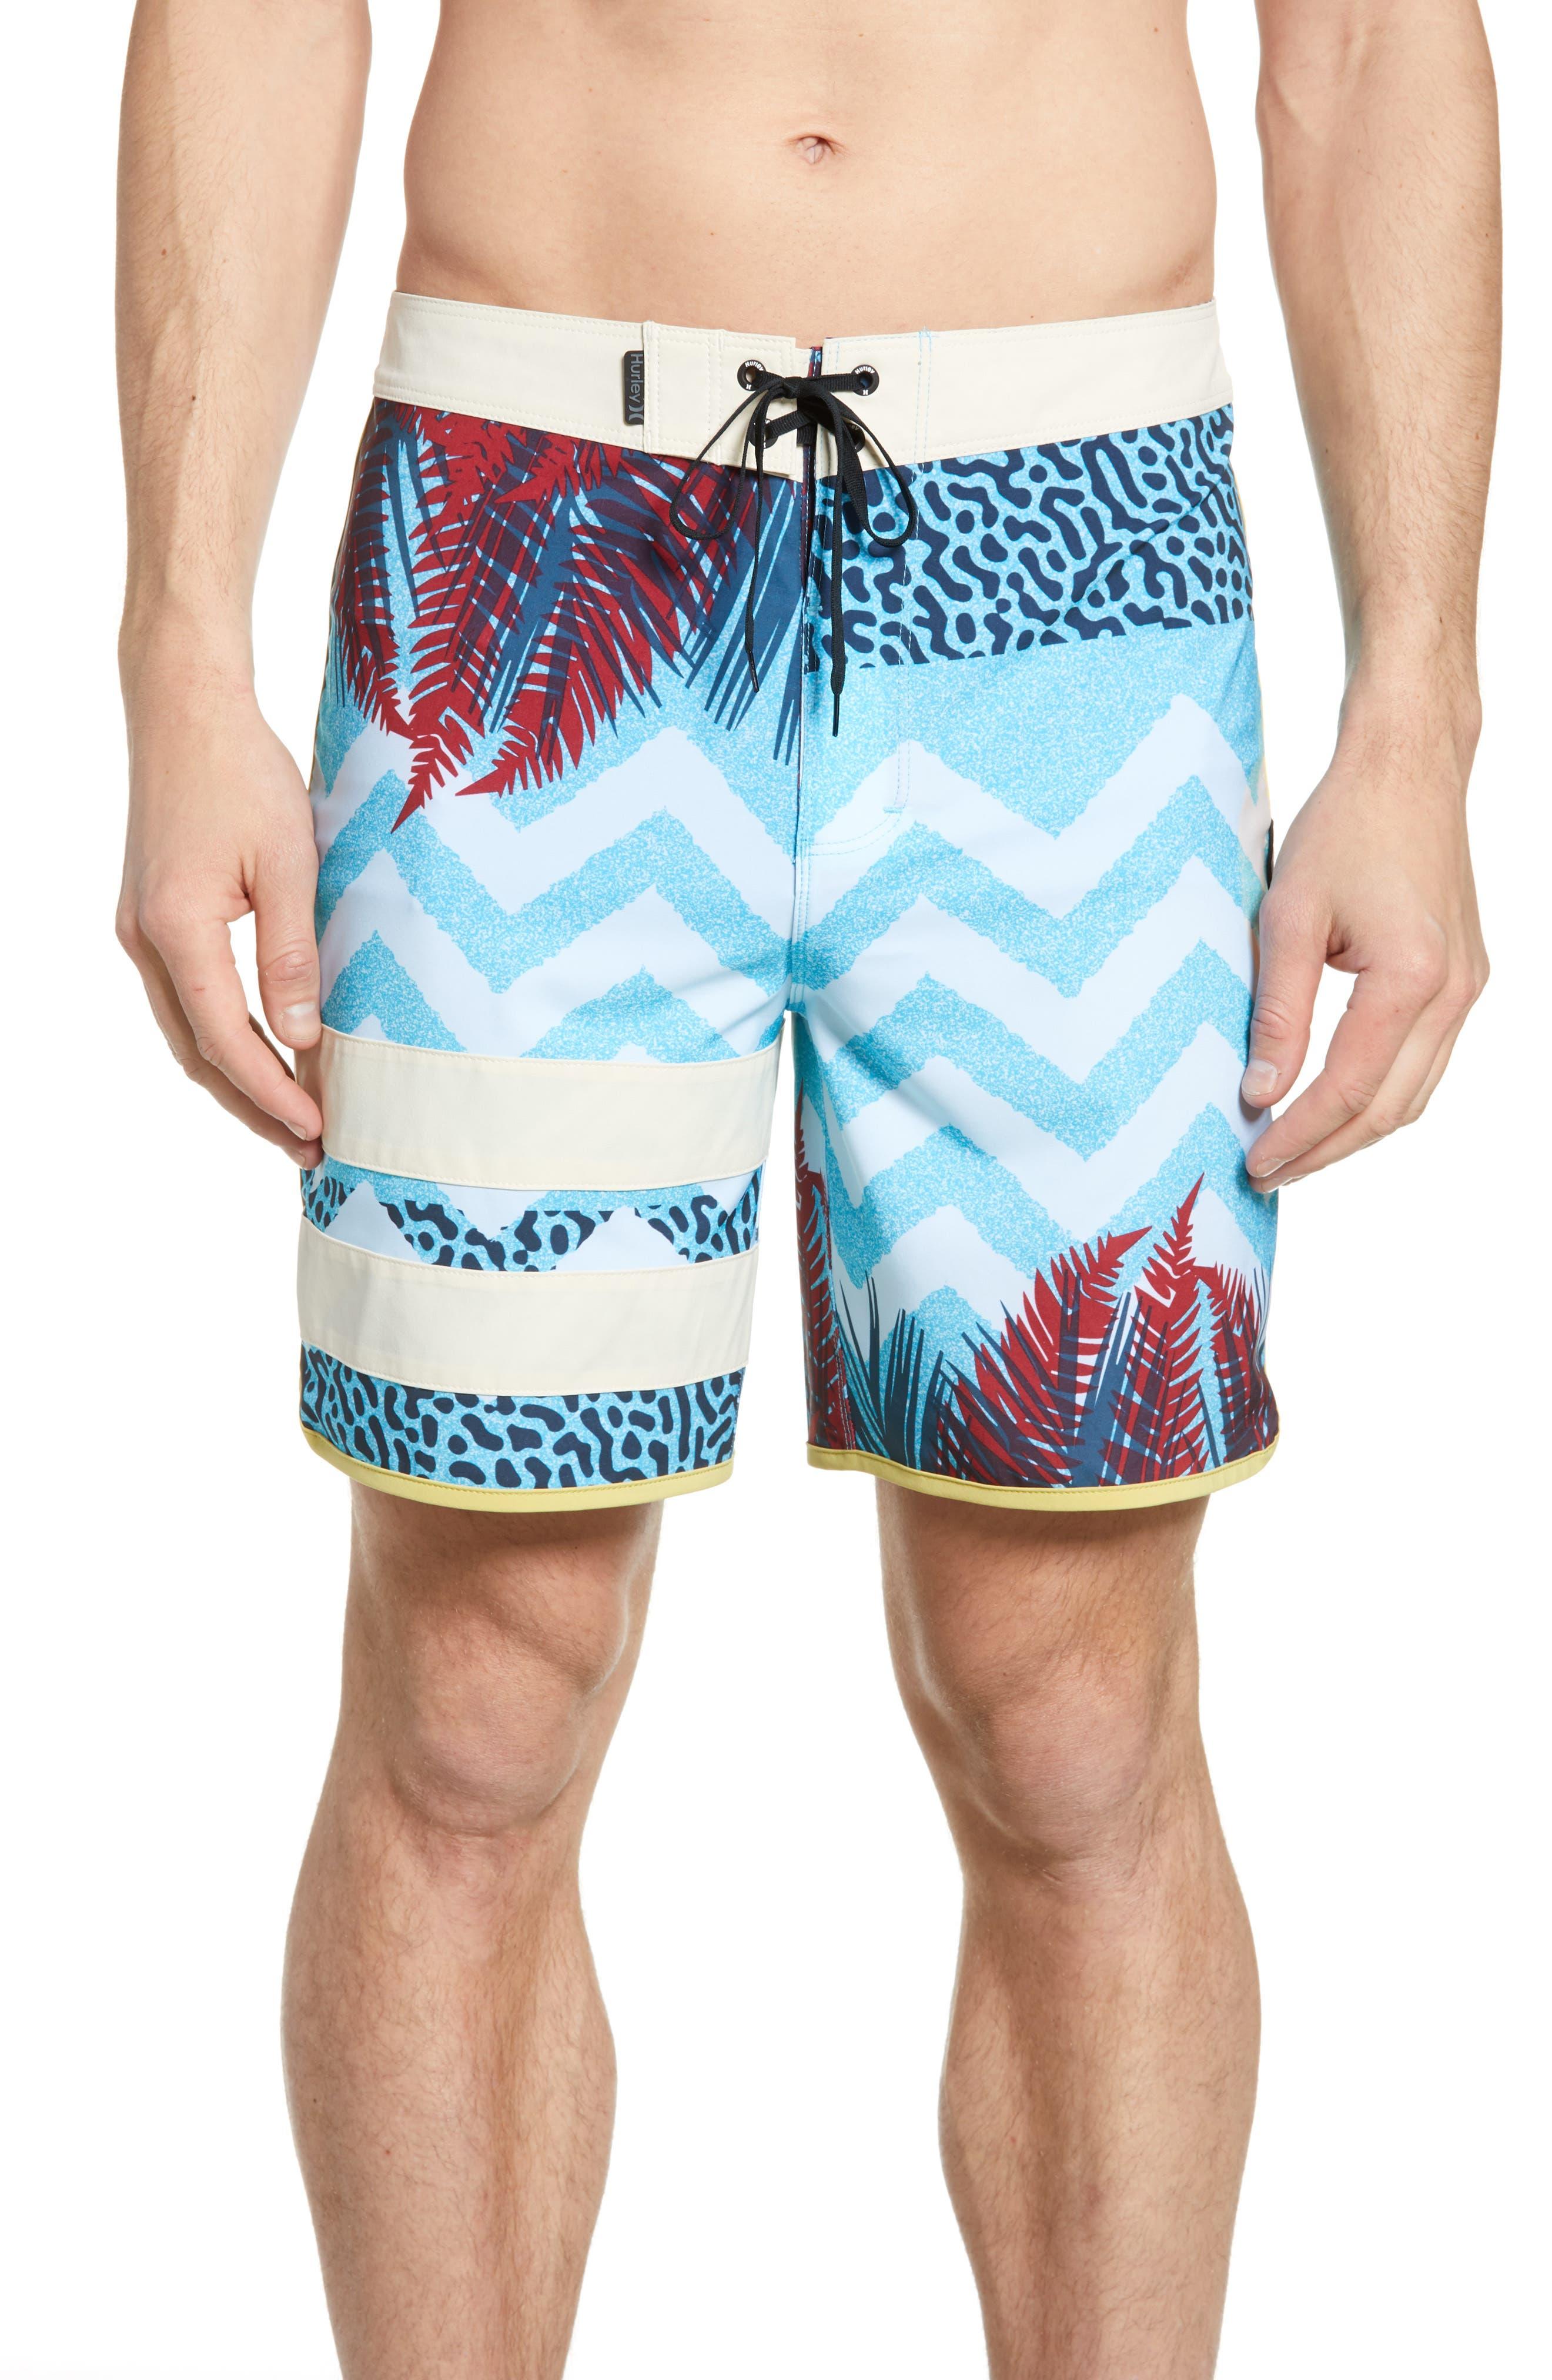 Hurley Phantom Block Party Shipwreck Print Board Shorts, Blue